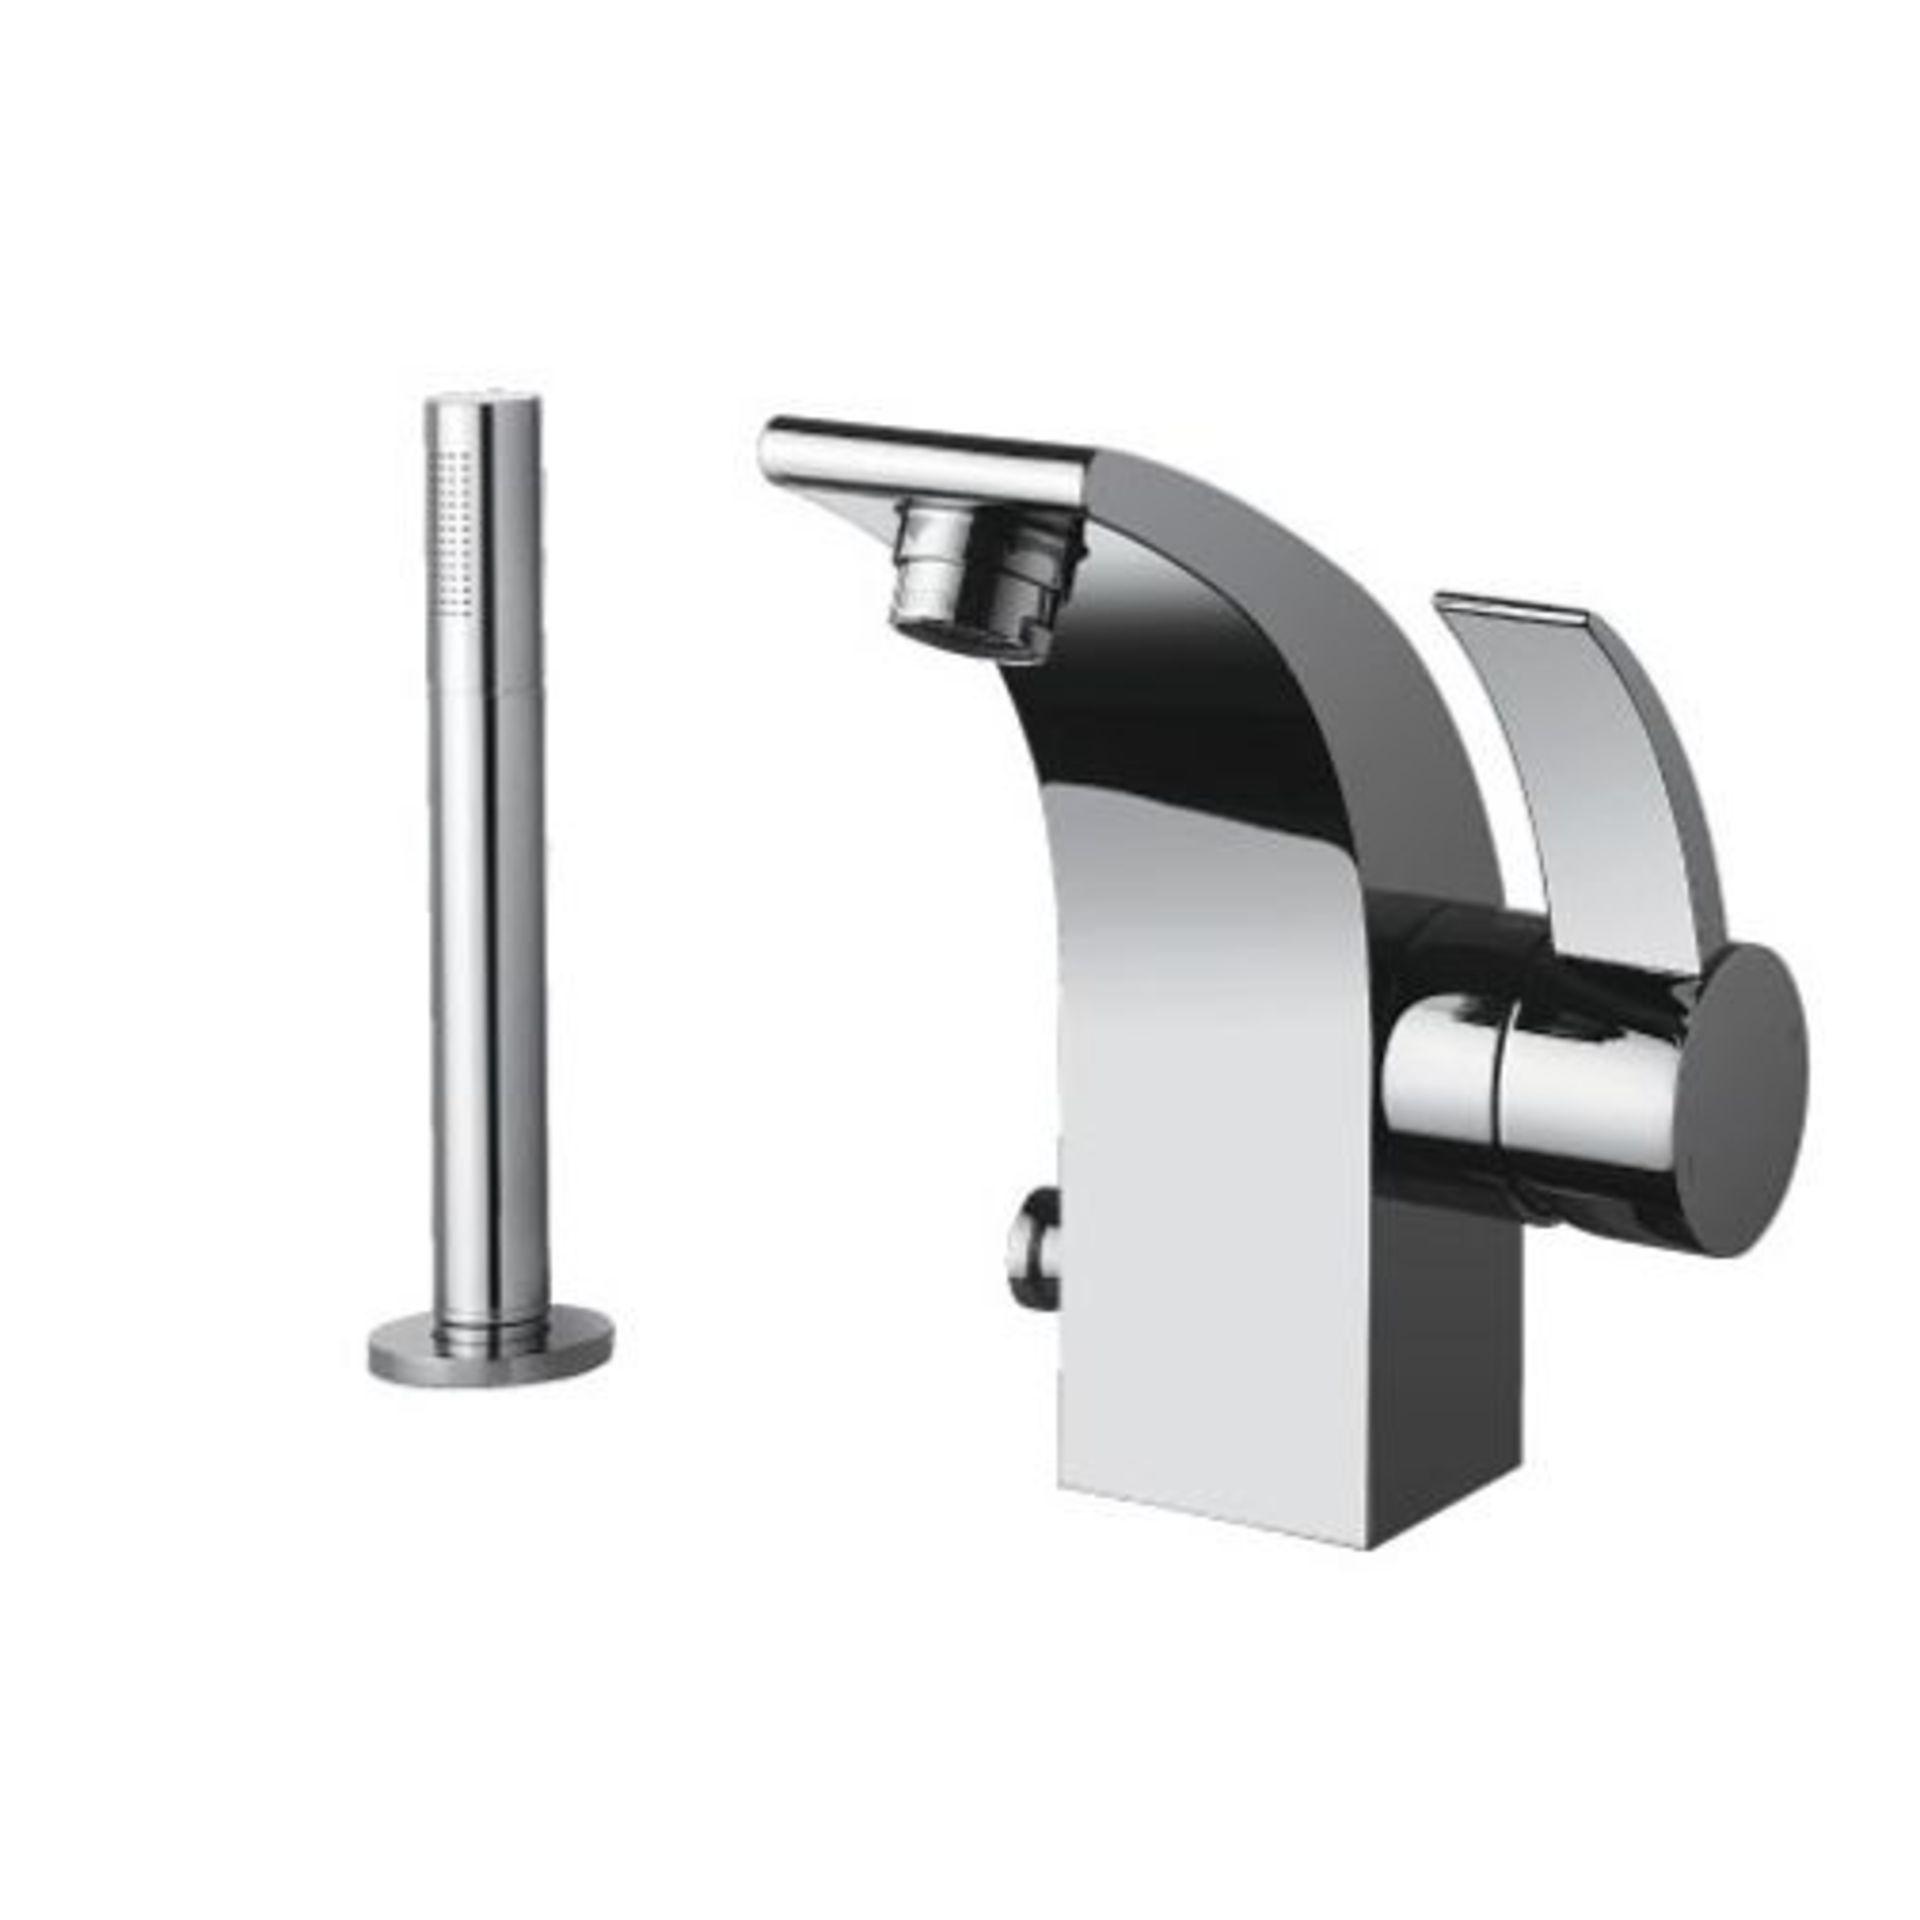 Lot 6 - Bathstore 'Sublime' very high quality, designer bath & shower mono mixer tap.